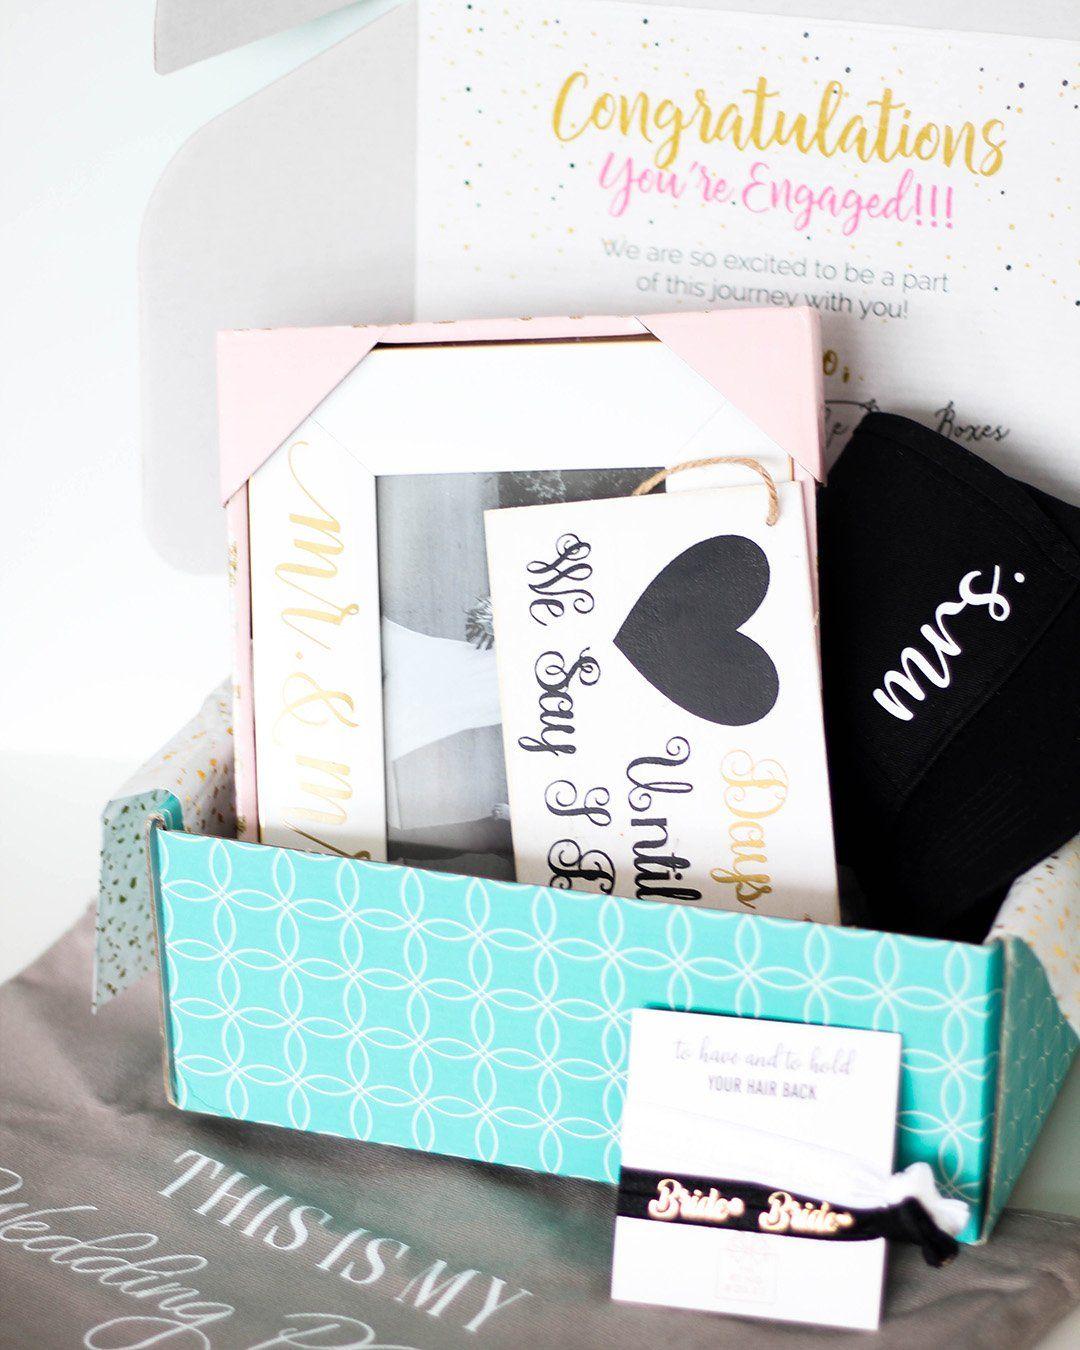 The Best Bridal Subscription Boxes For 2021 2022 Brides Subscription Box Review The Ring Box Bride Subscription Box Family Wedding Photos The Wedding Date